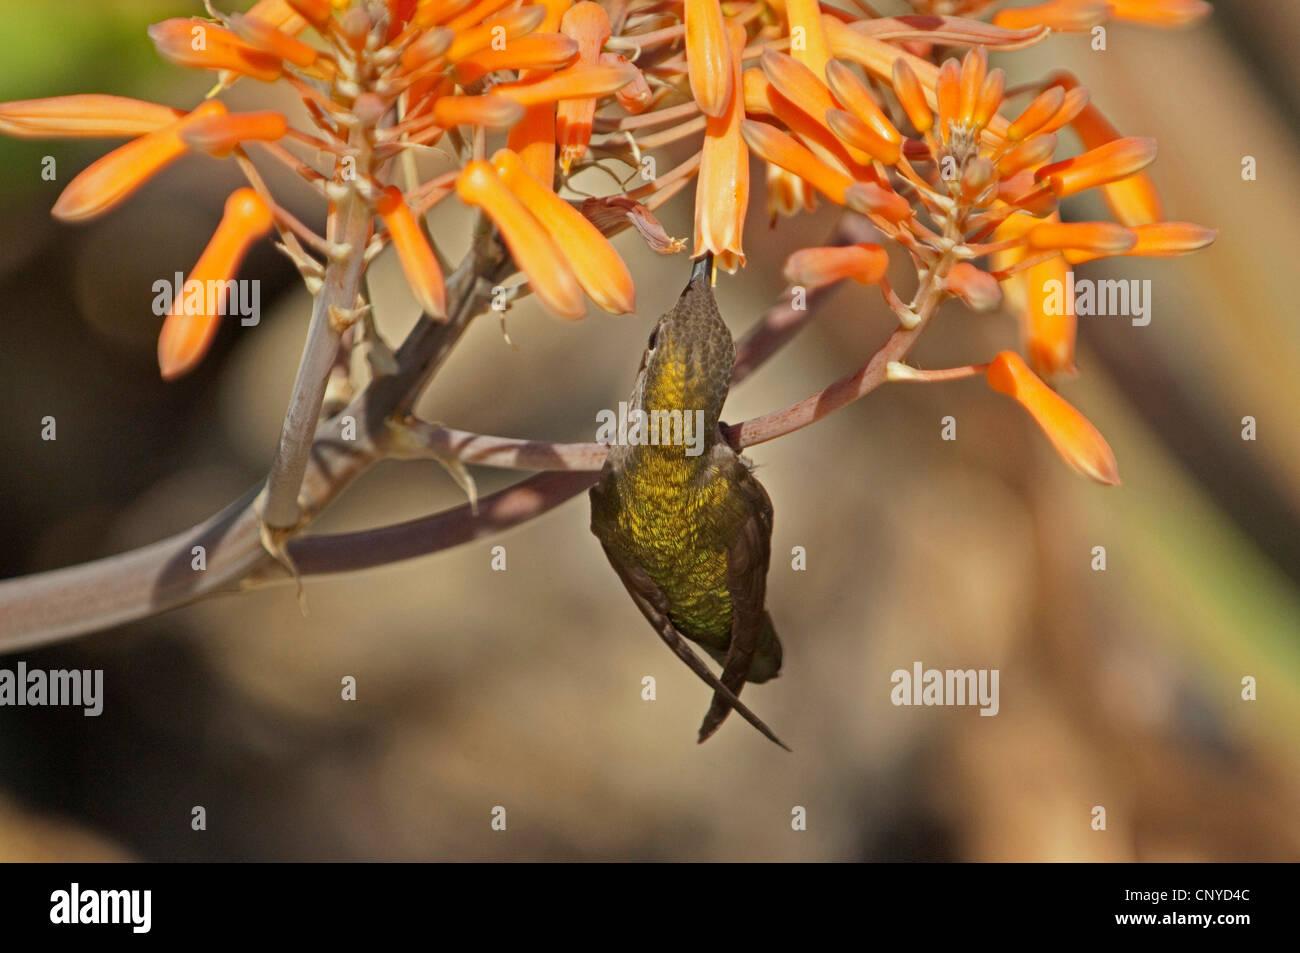 hummingbird feeding on the nectar of a flower, USA, California - Stock Image